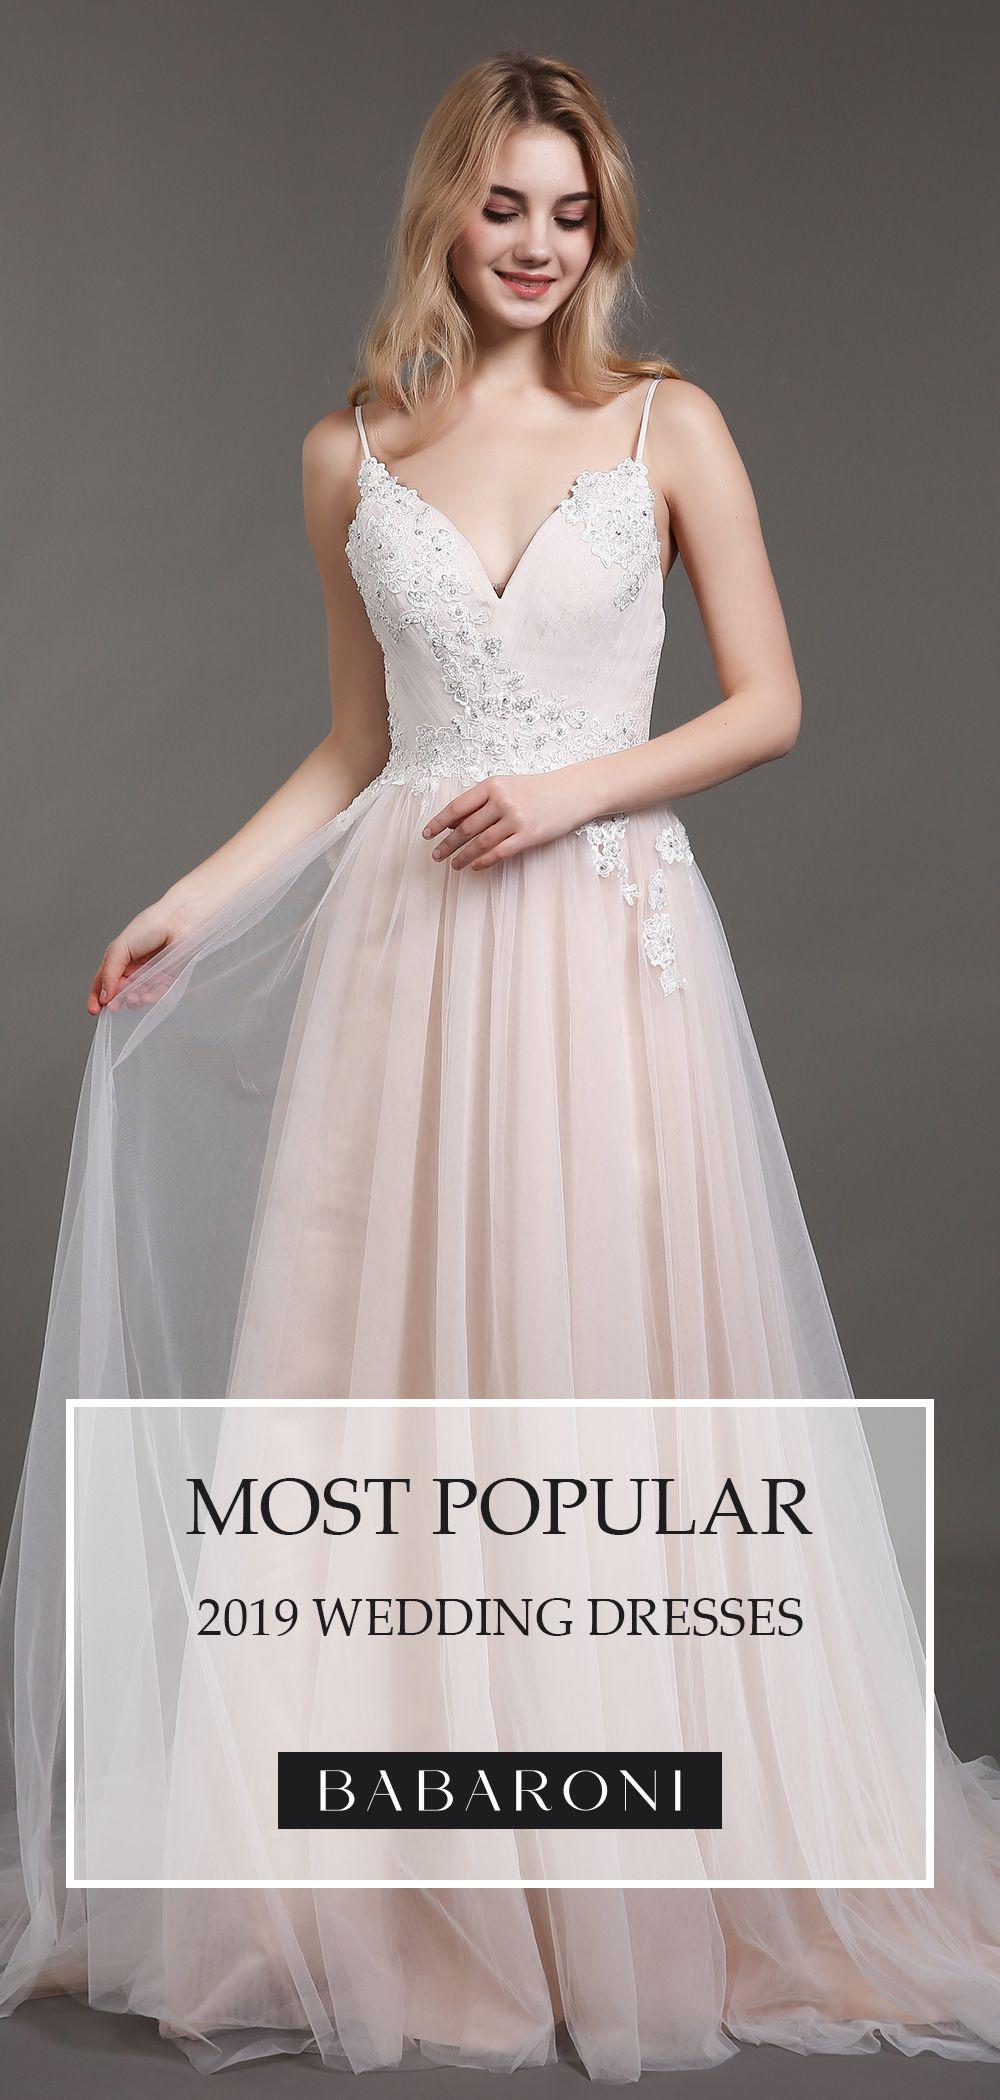 Babaroni Esther Lace Bridal Gown Dresses Spaghetti Strap Wedding Dress [ 2100 x 1000 Pixel ]